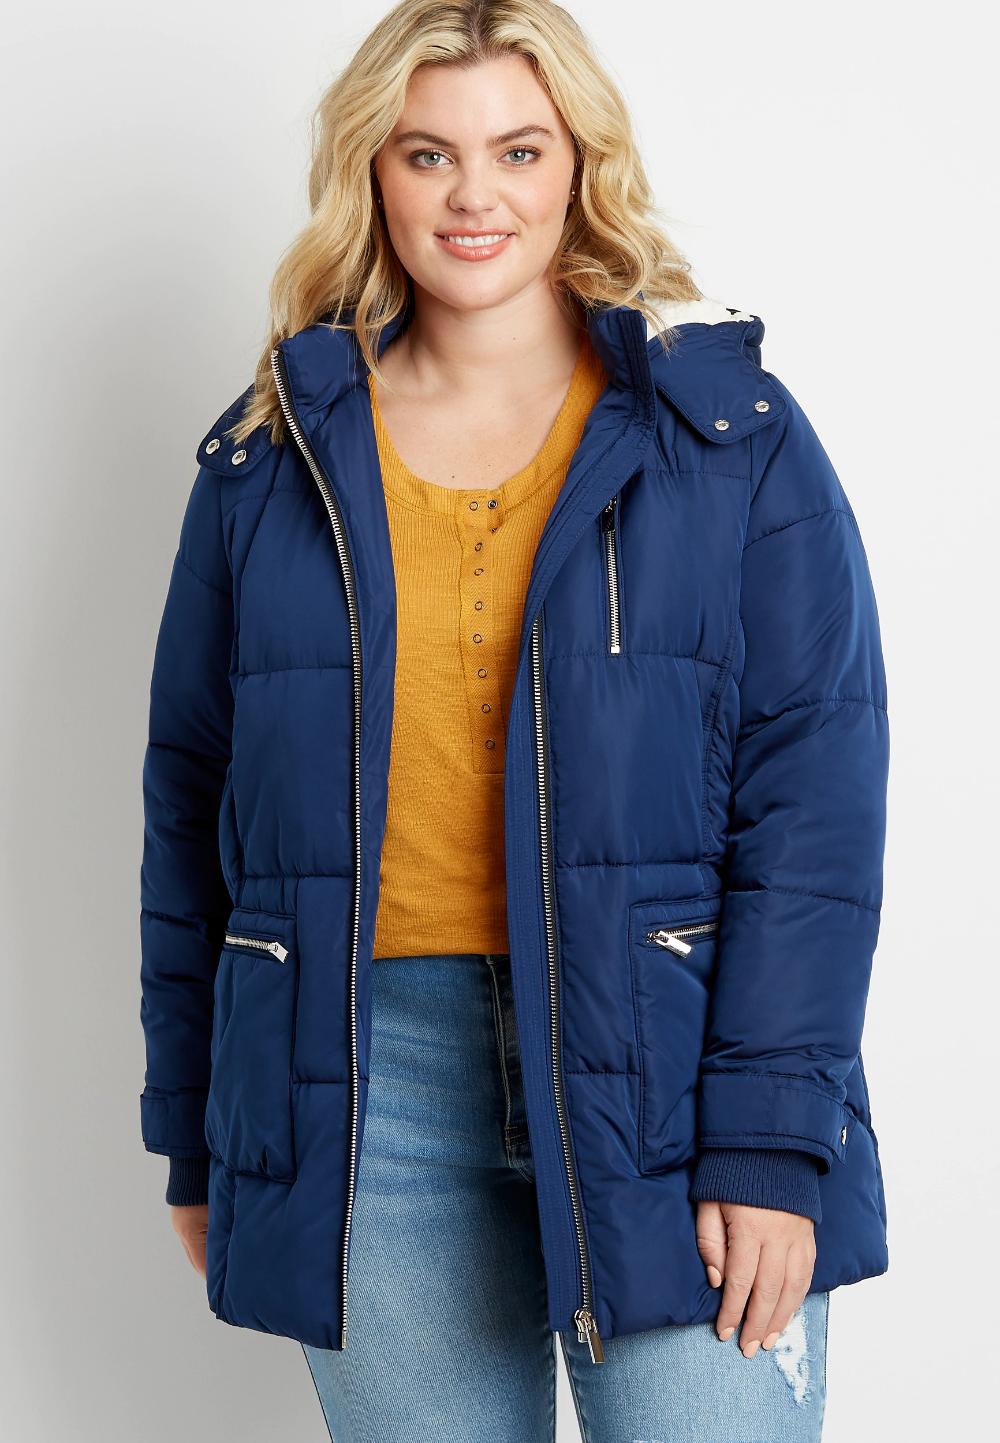 Plus Size Blue Sherpa Lined Hooded Puffer Outerwear Jacket Outerwear Jackets Outerwear Sherpa Lined [ 1443 x 1000 Pixel ]